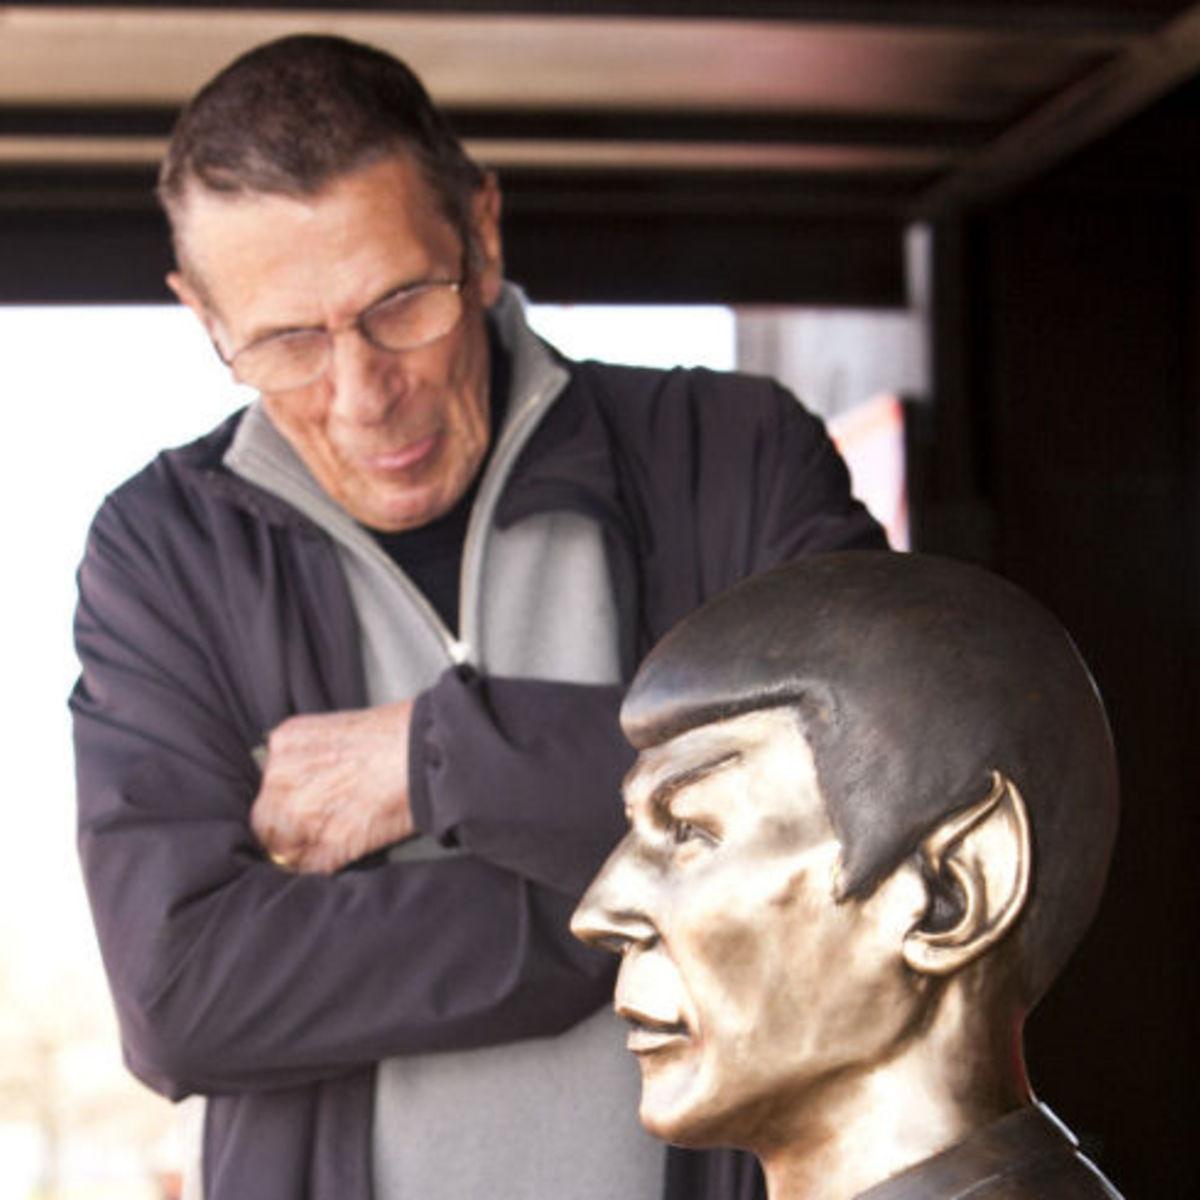 Star_Trek_Nimoy_Vulcan_2_thumb_0.jpg